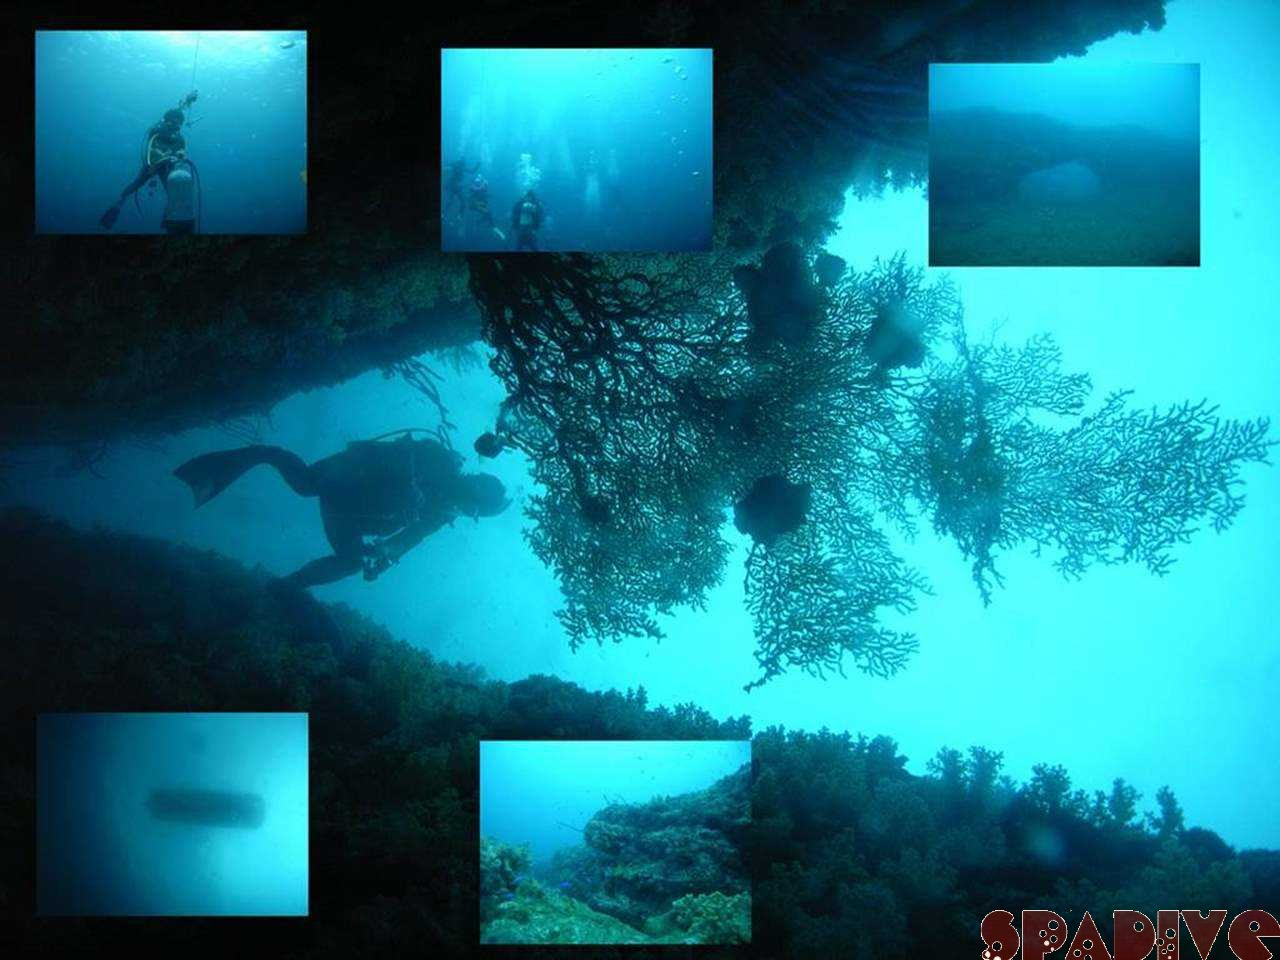 Wアーチ&中島観測塔ボートダイビング|ディープSP|9/21/2007